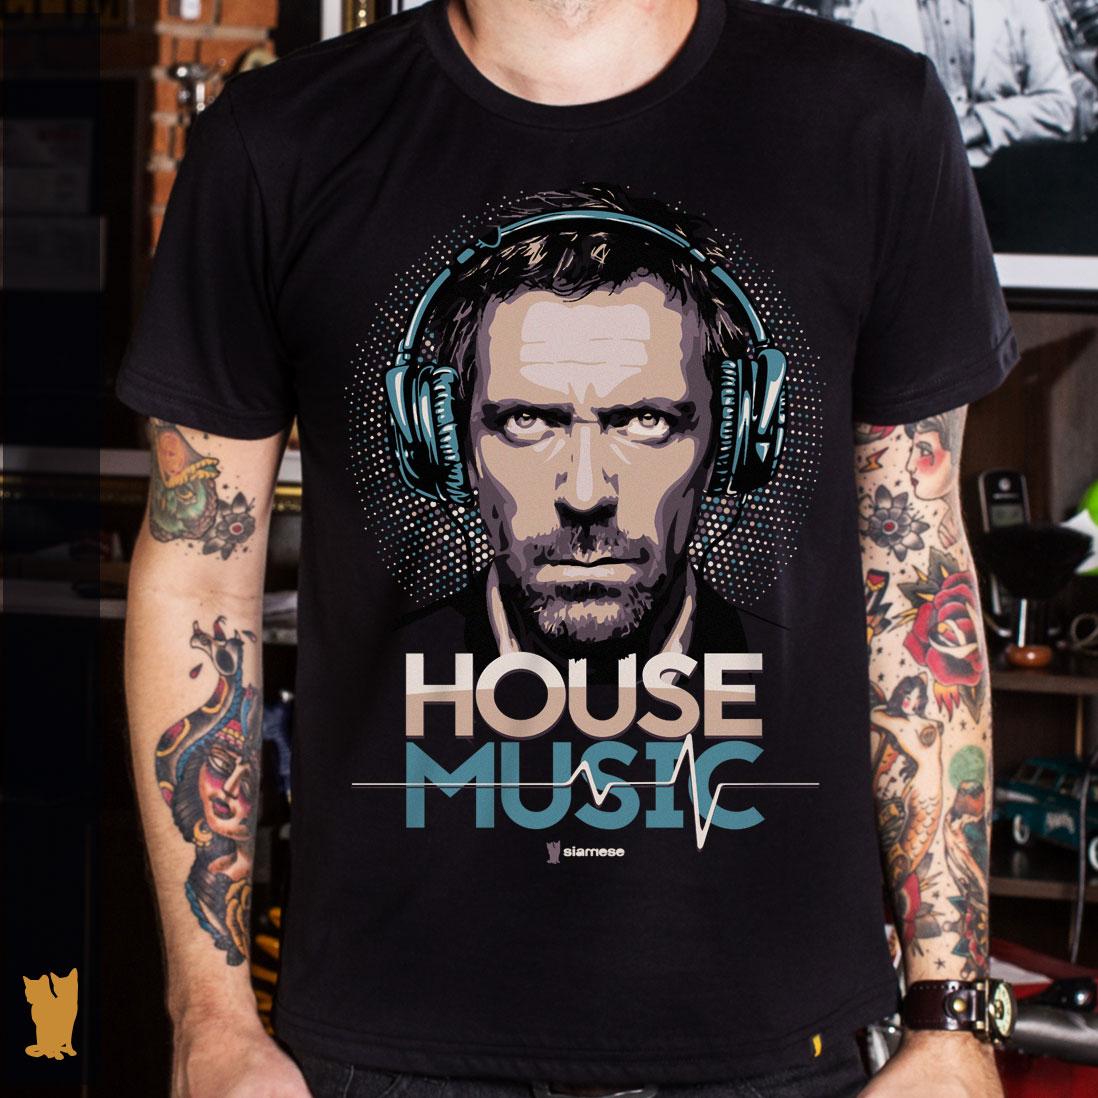 CAMISETA HOUSE MUSIC - PRETA